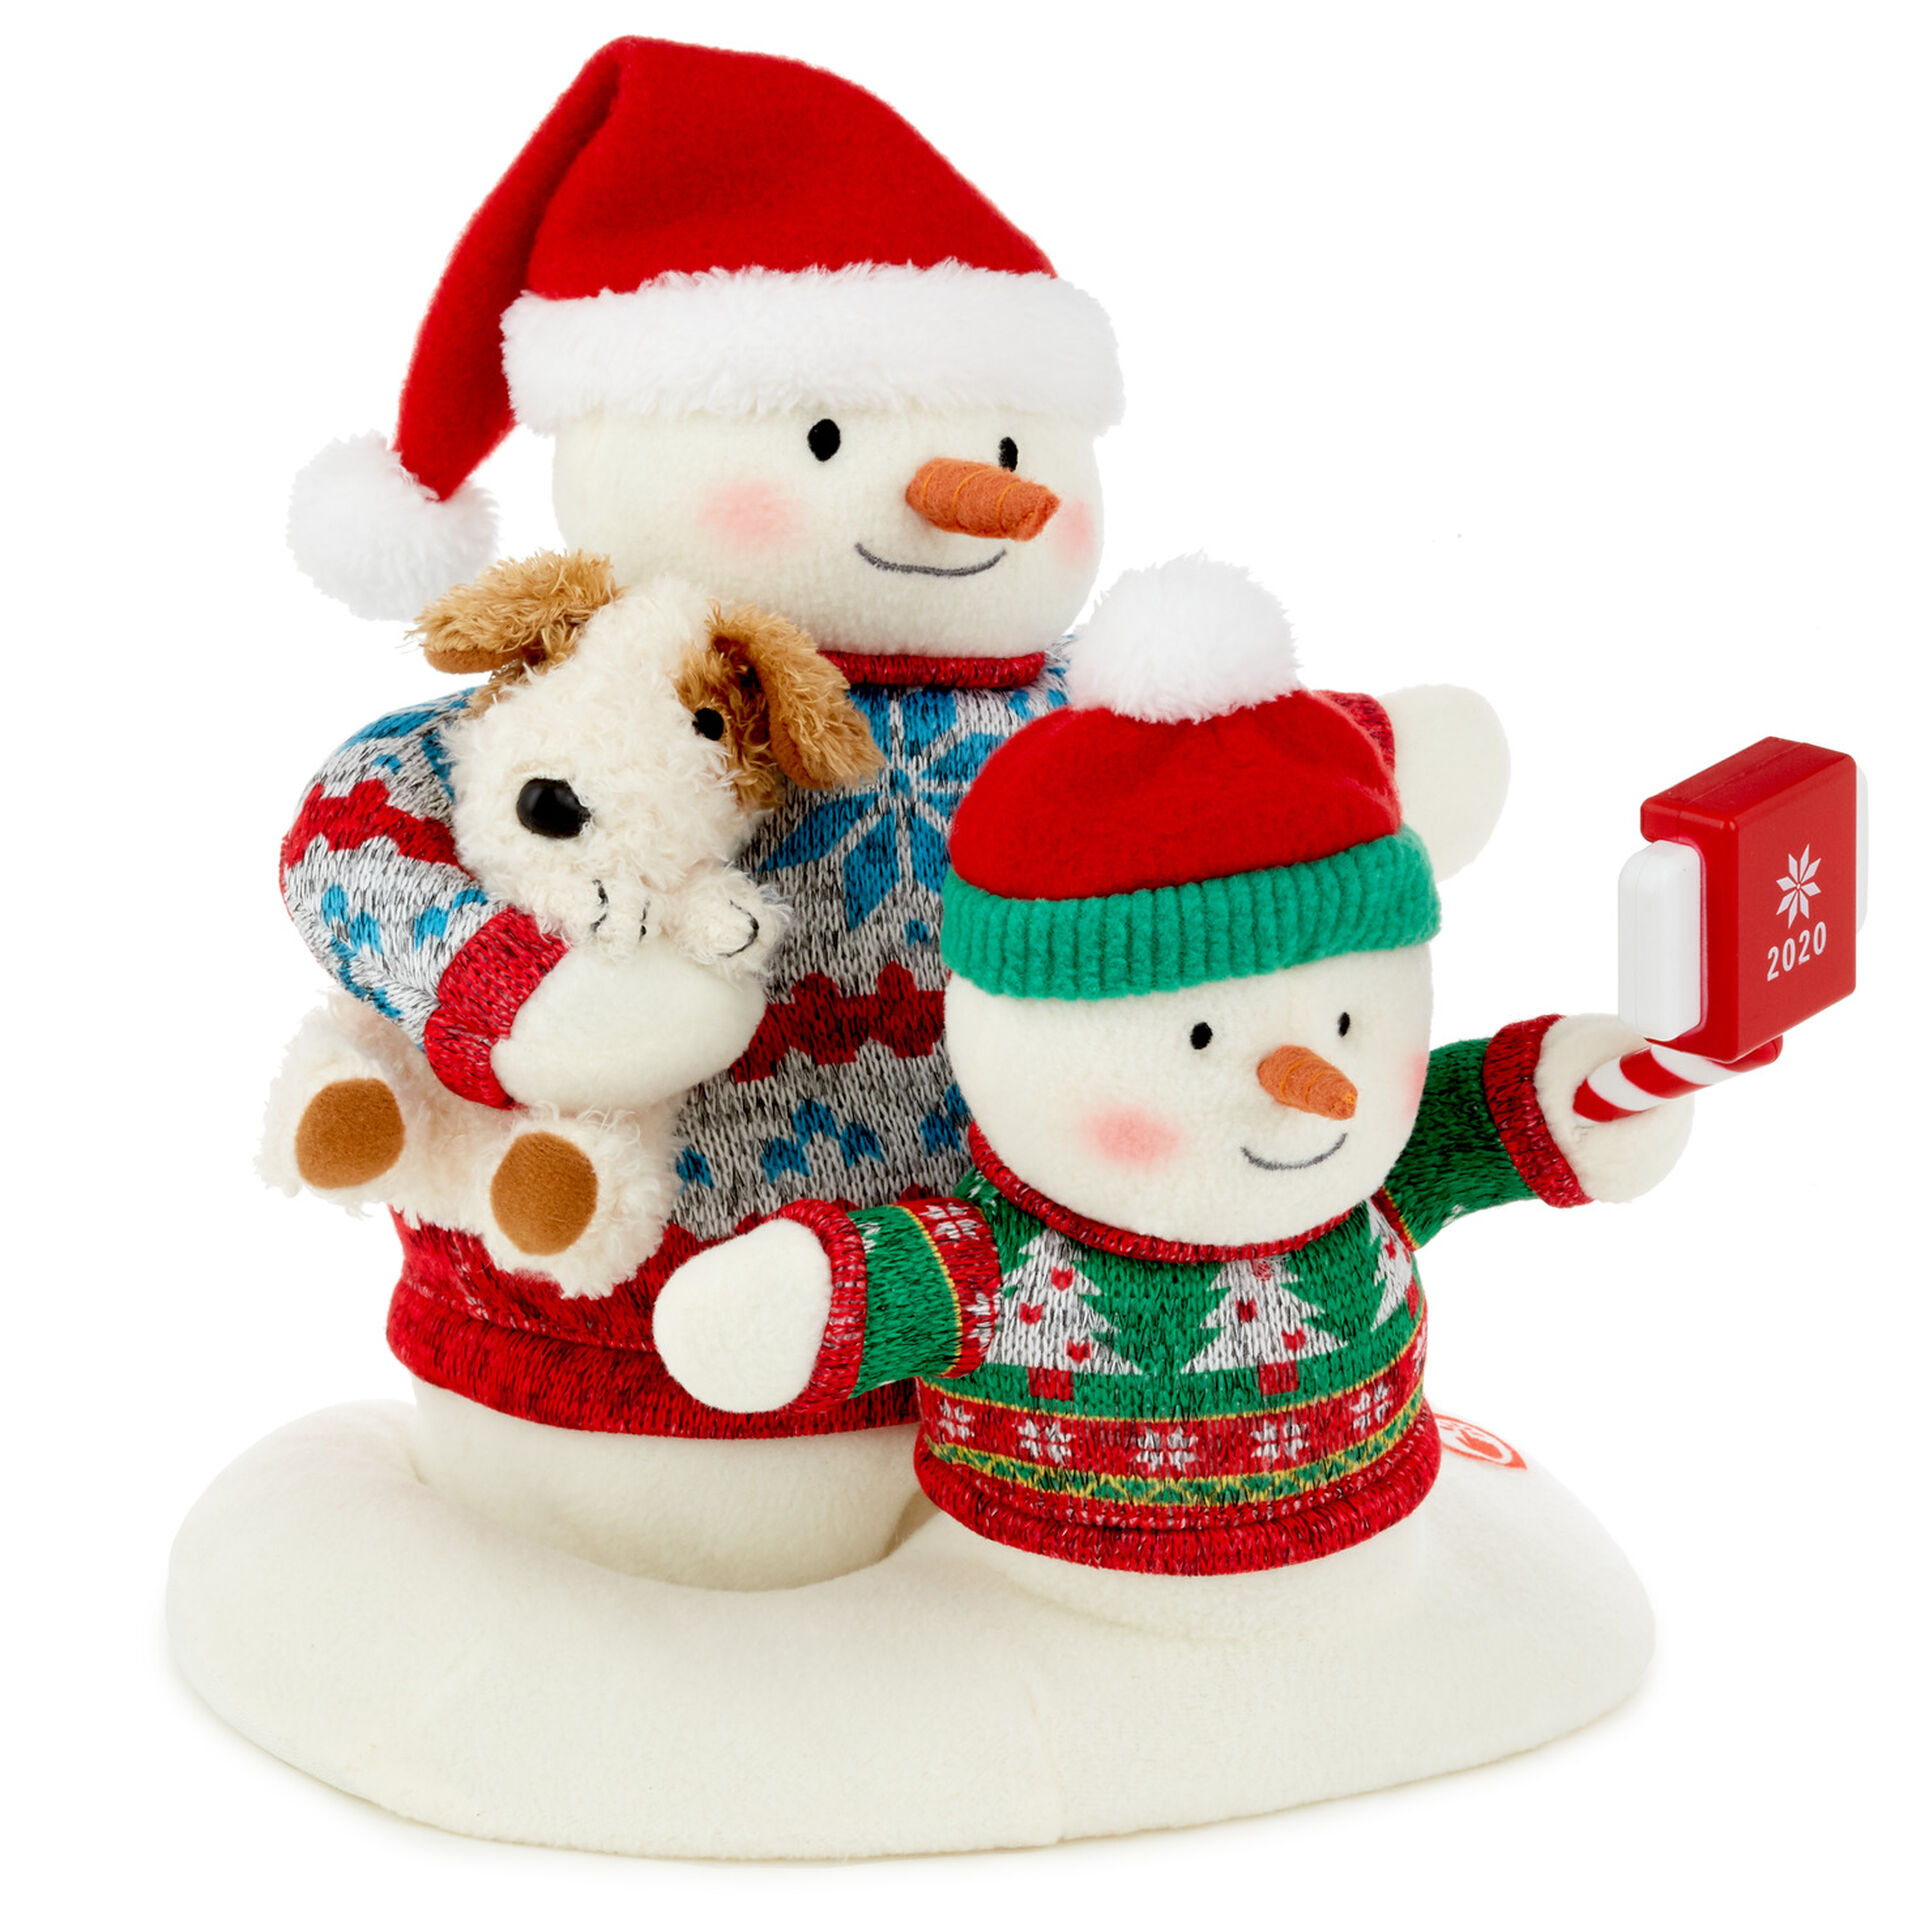 2020  Christmas Snowman Cozy Christmas Selfie Snowman 2020 Singing Stuffed Animal With